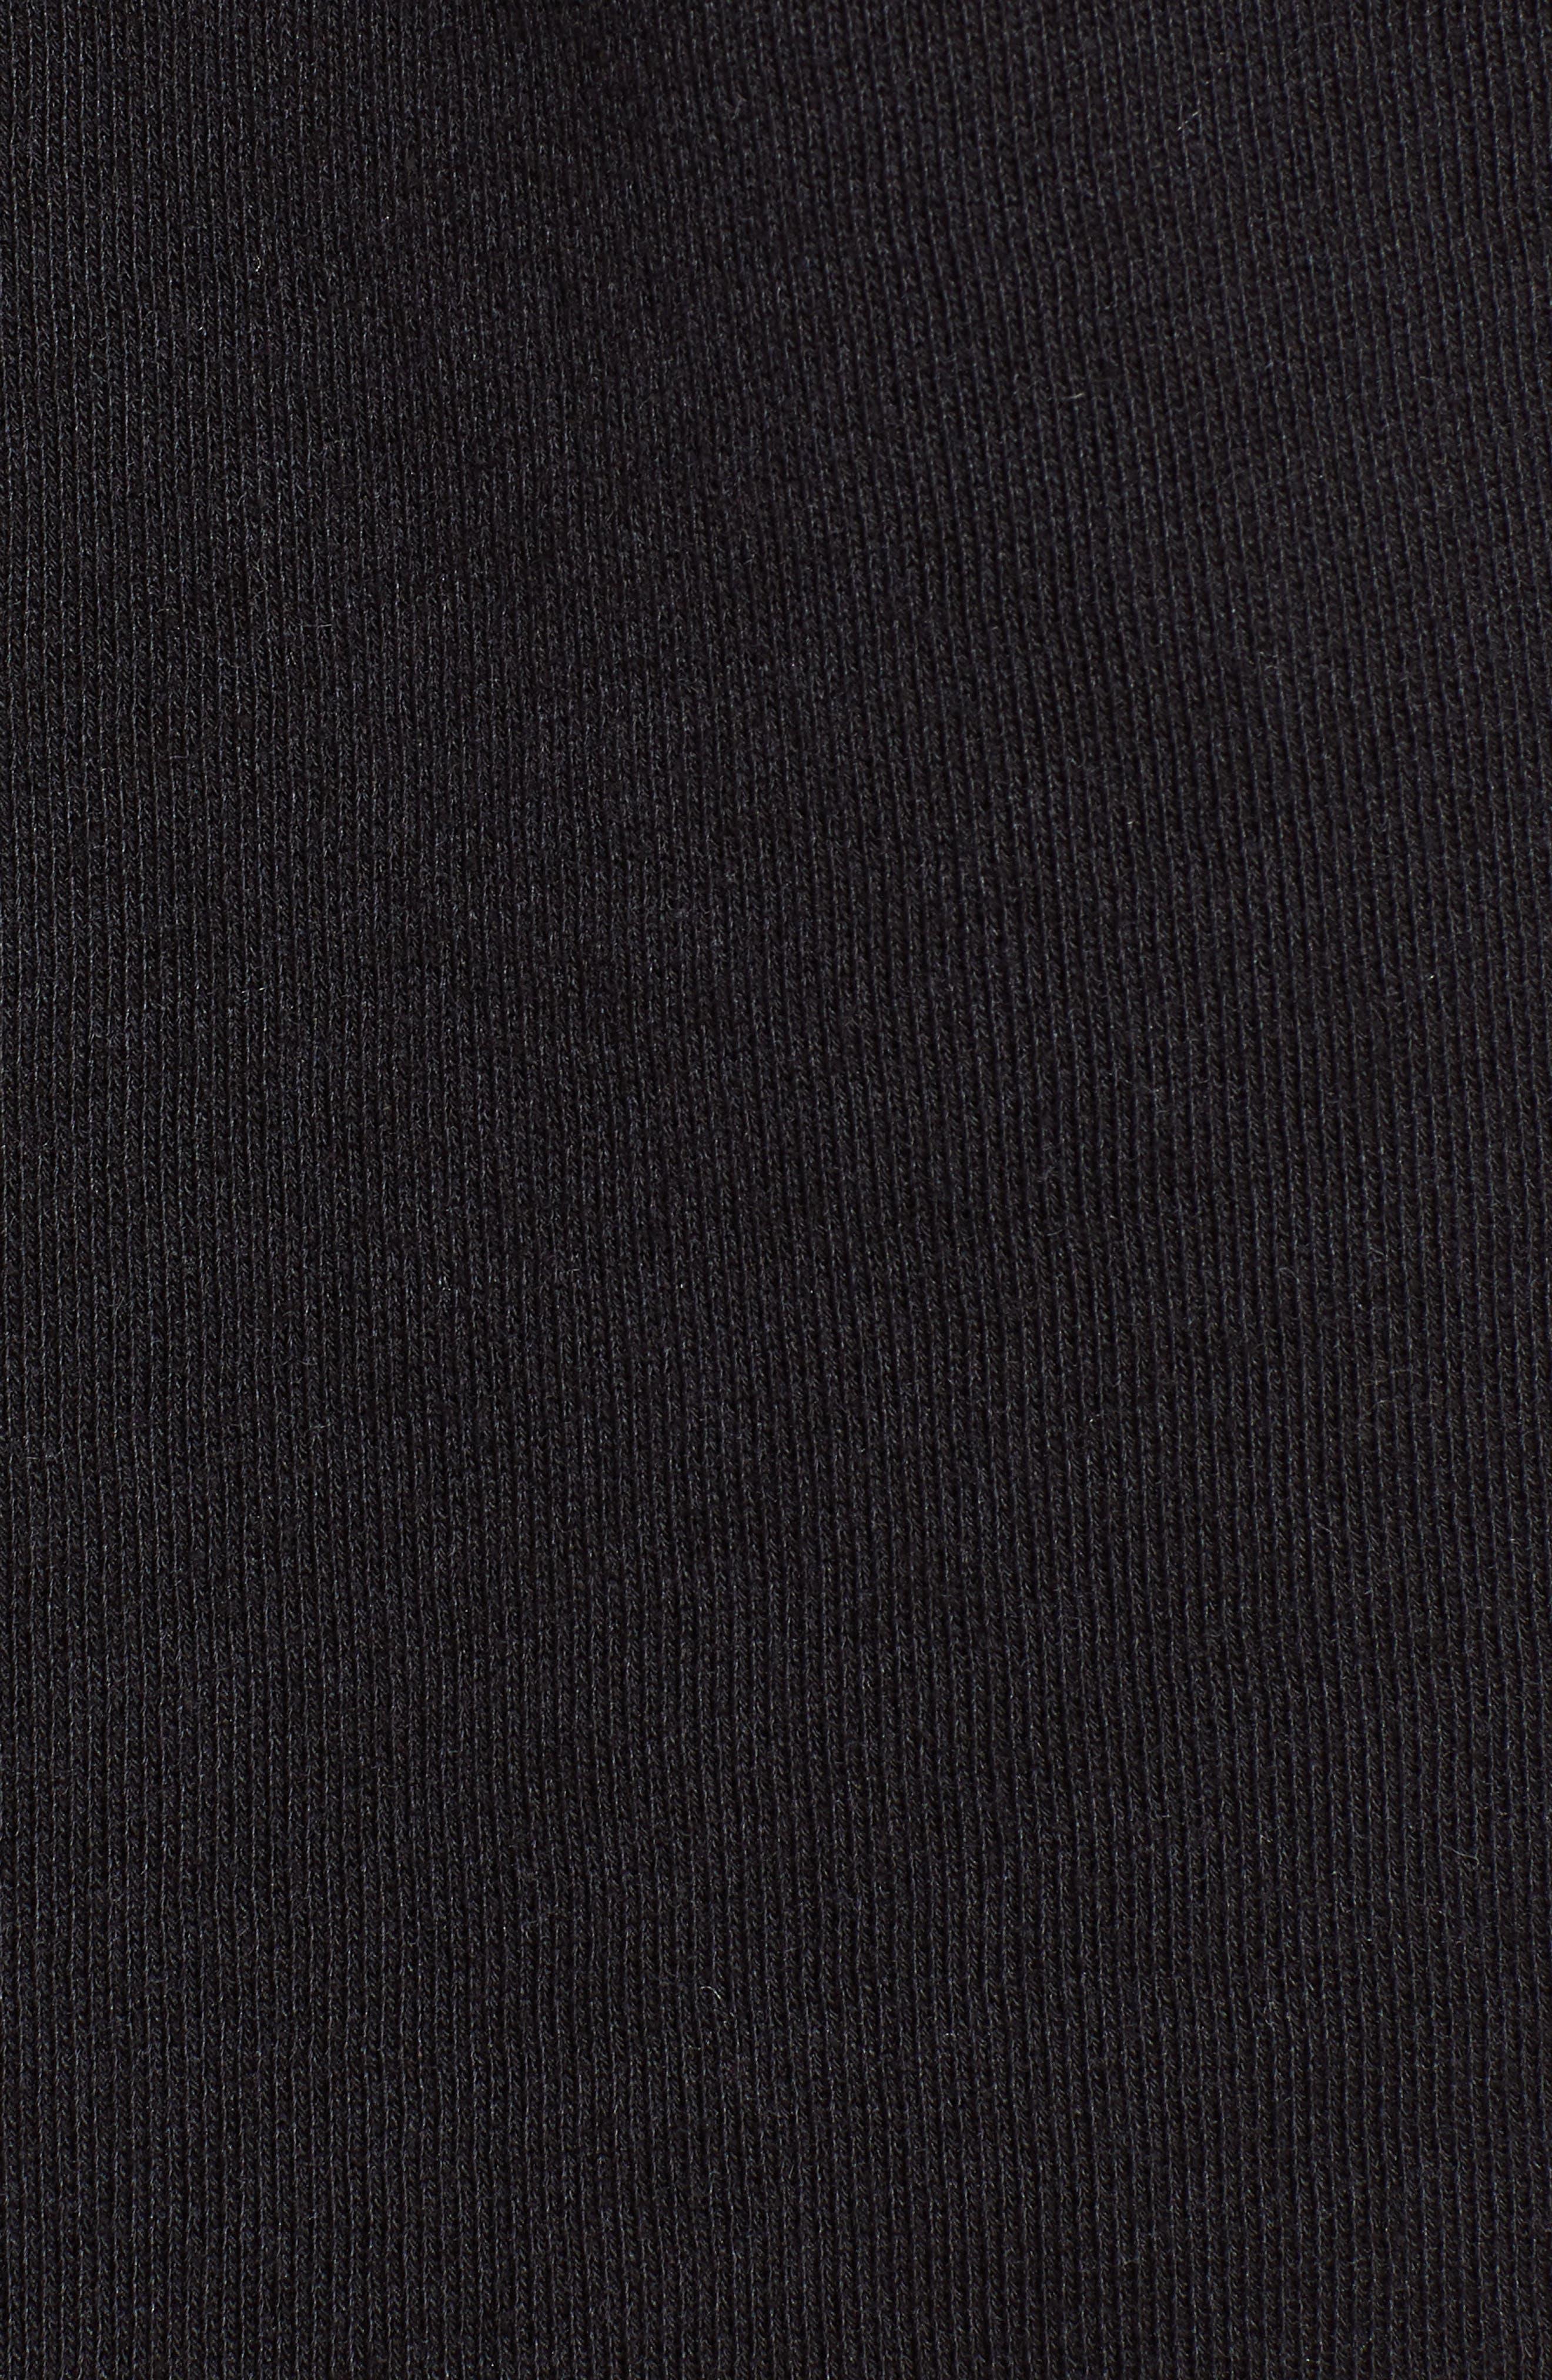 Golden Shorts,                             Alternate thumbnail 5, color,                             JET BLACK